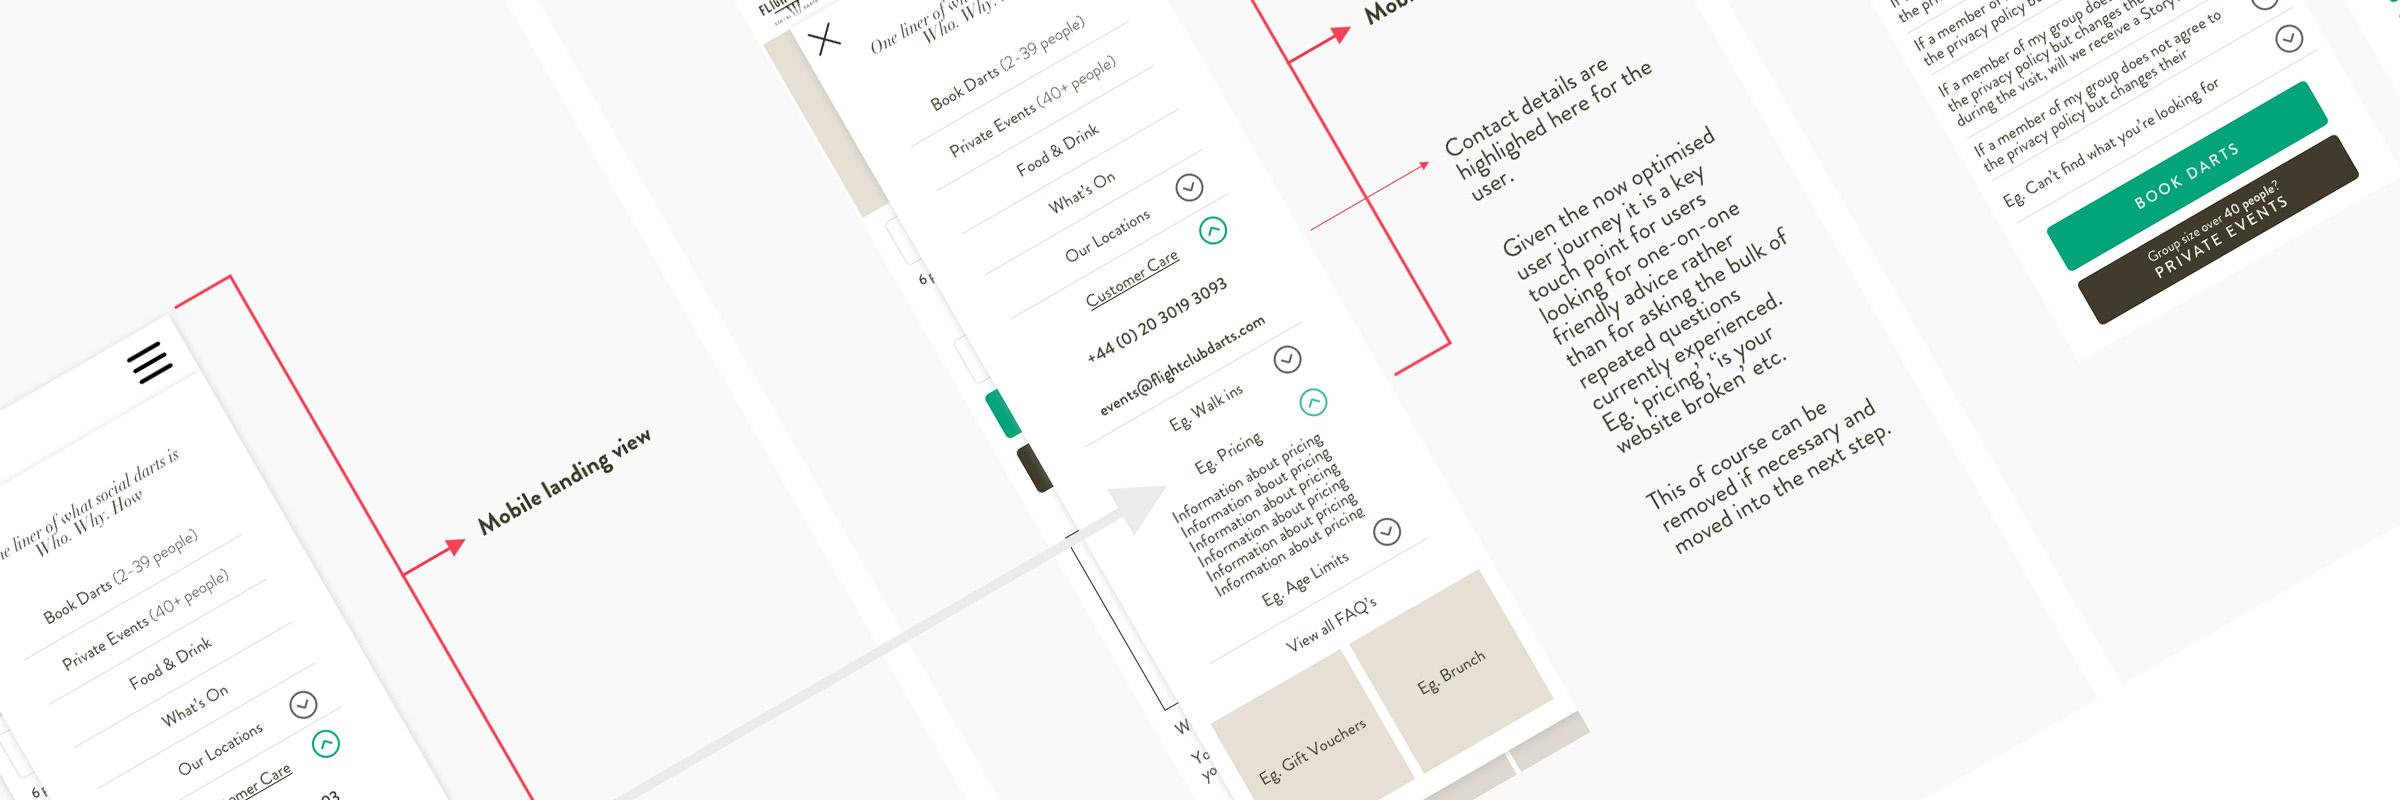 laurengracedesign-freelance-ux-designer-consultant-flight-club-darts-wireframe-banner.jpeg